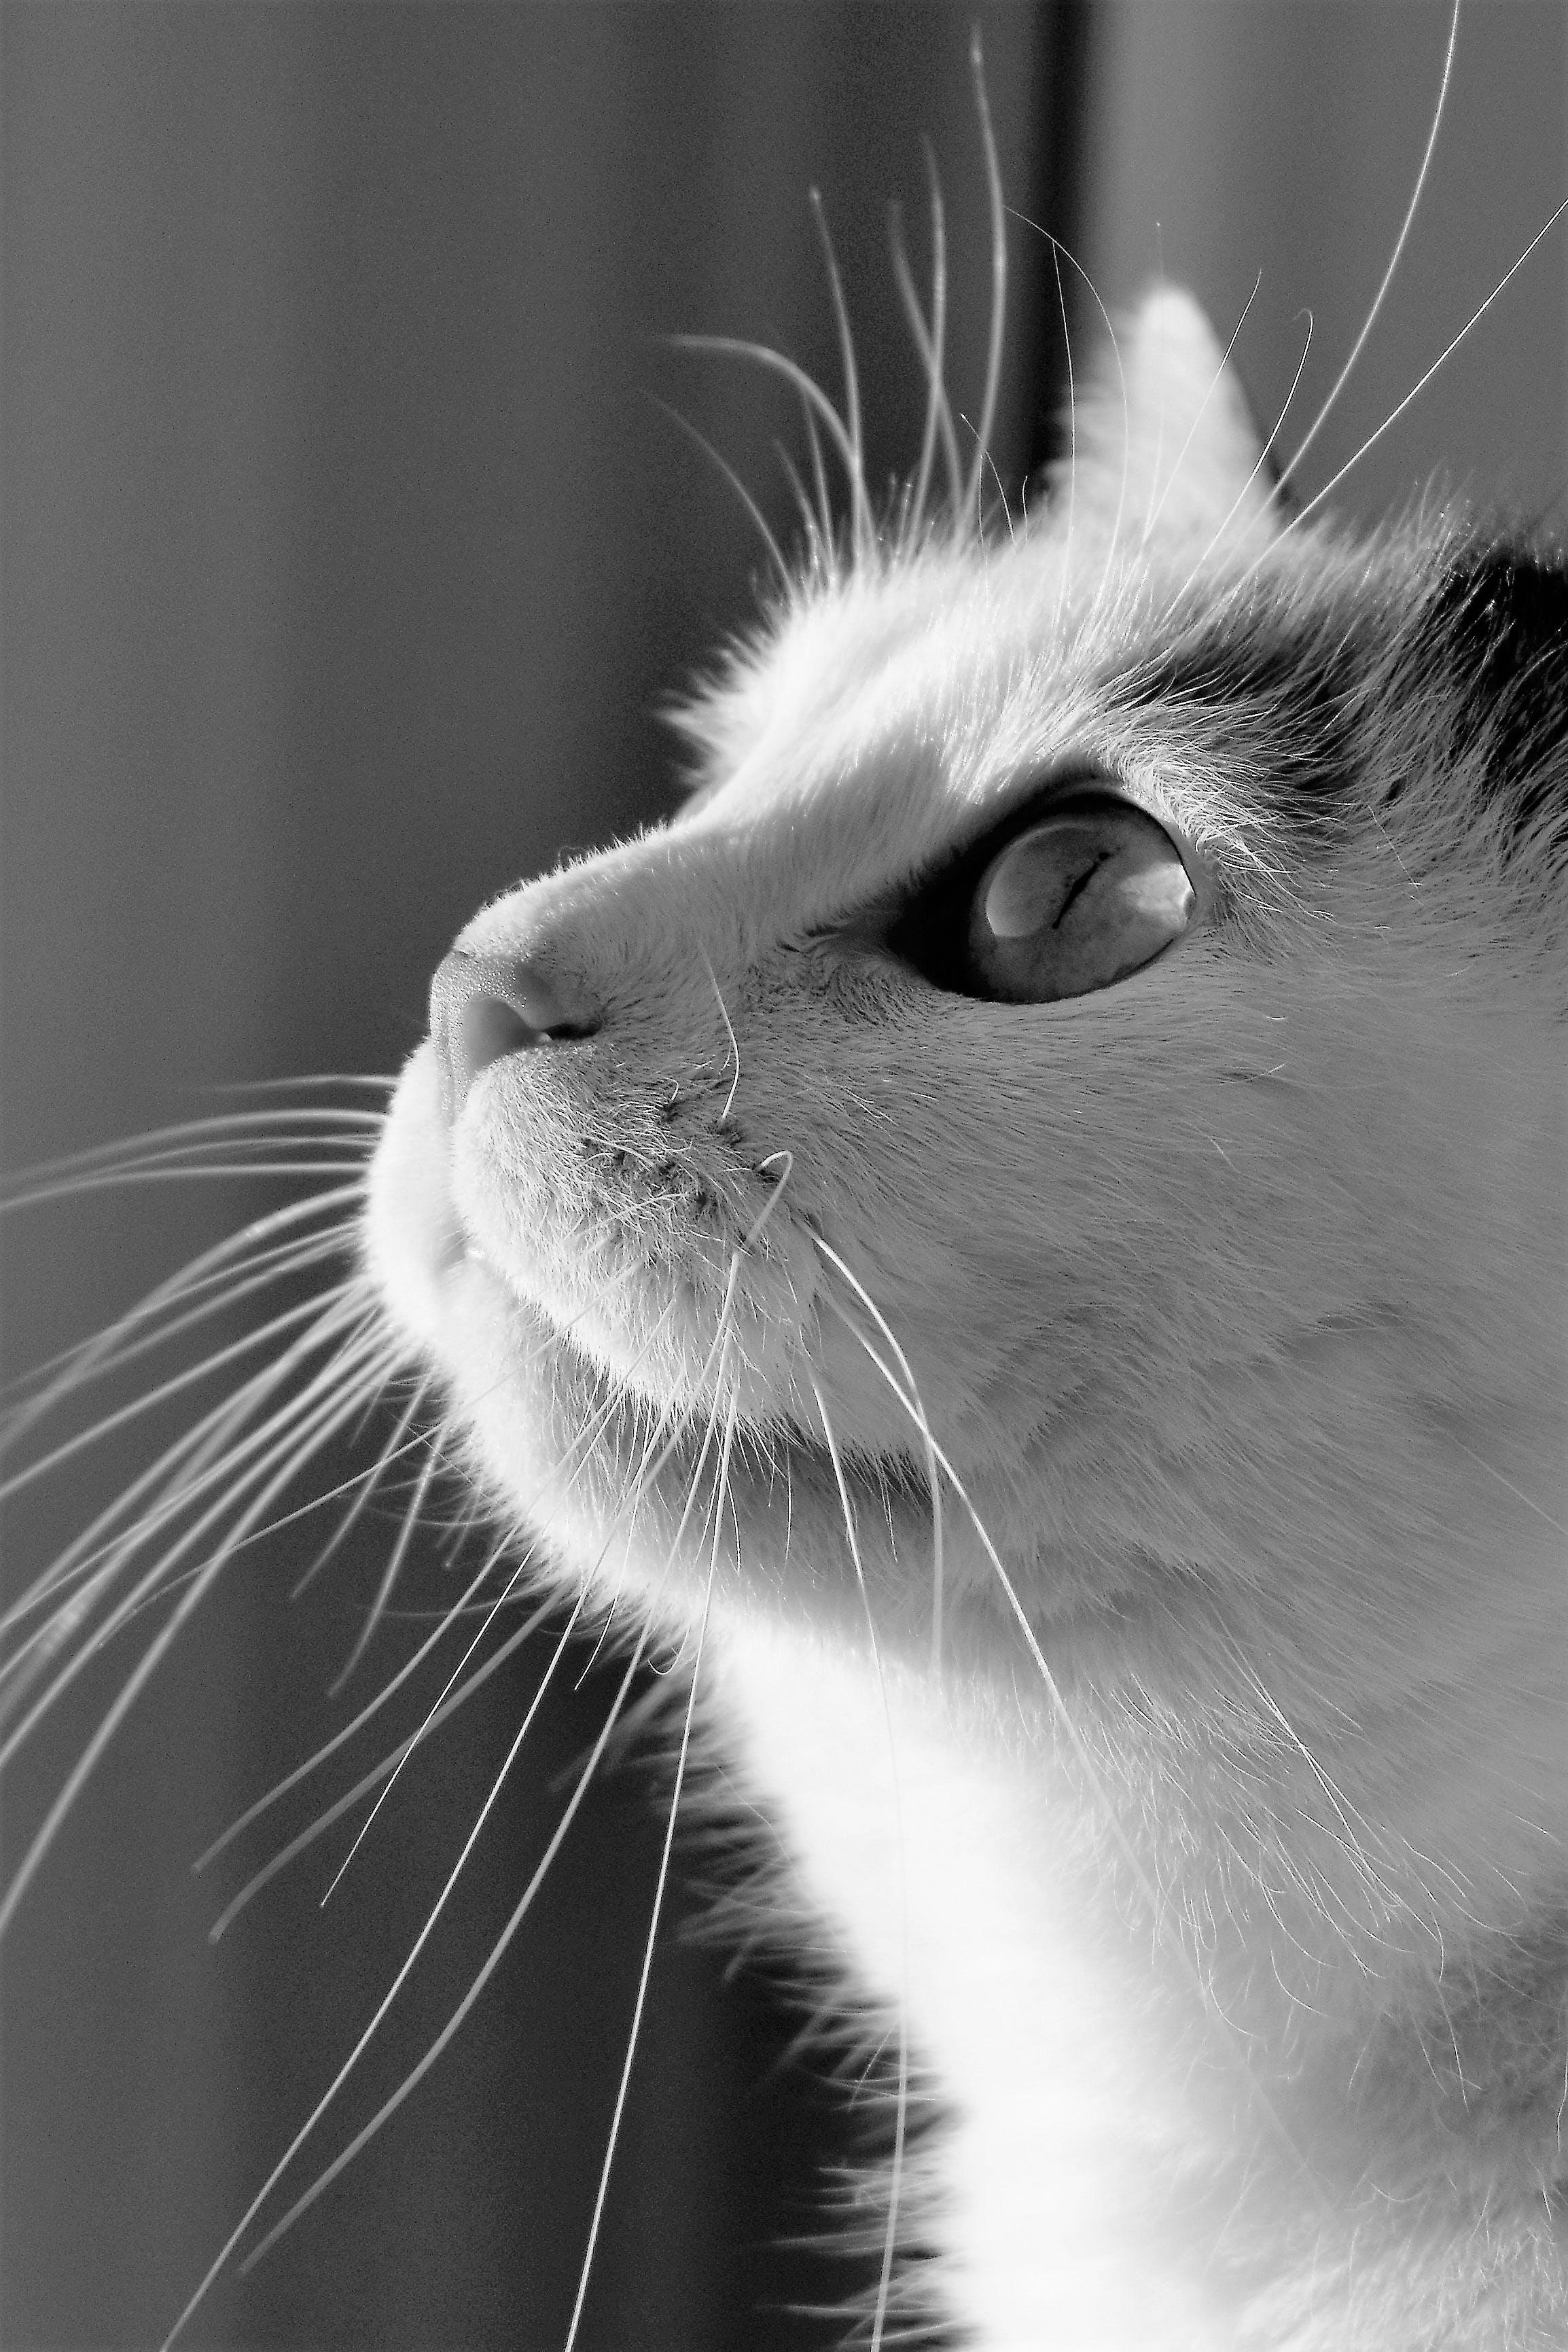 Free stock photo of black-and-white, animal, pet, fur